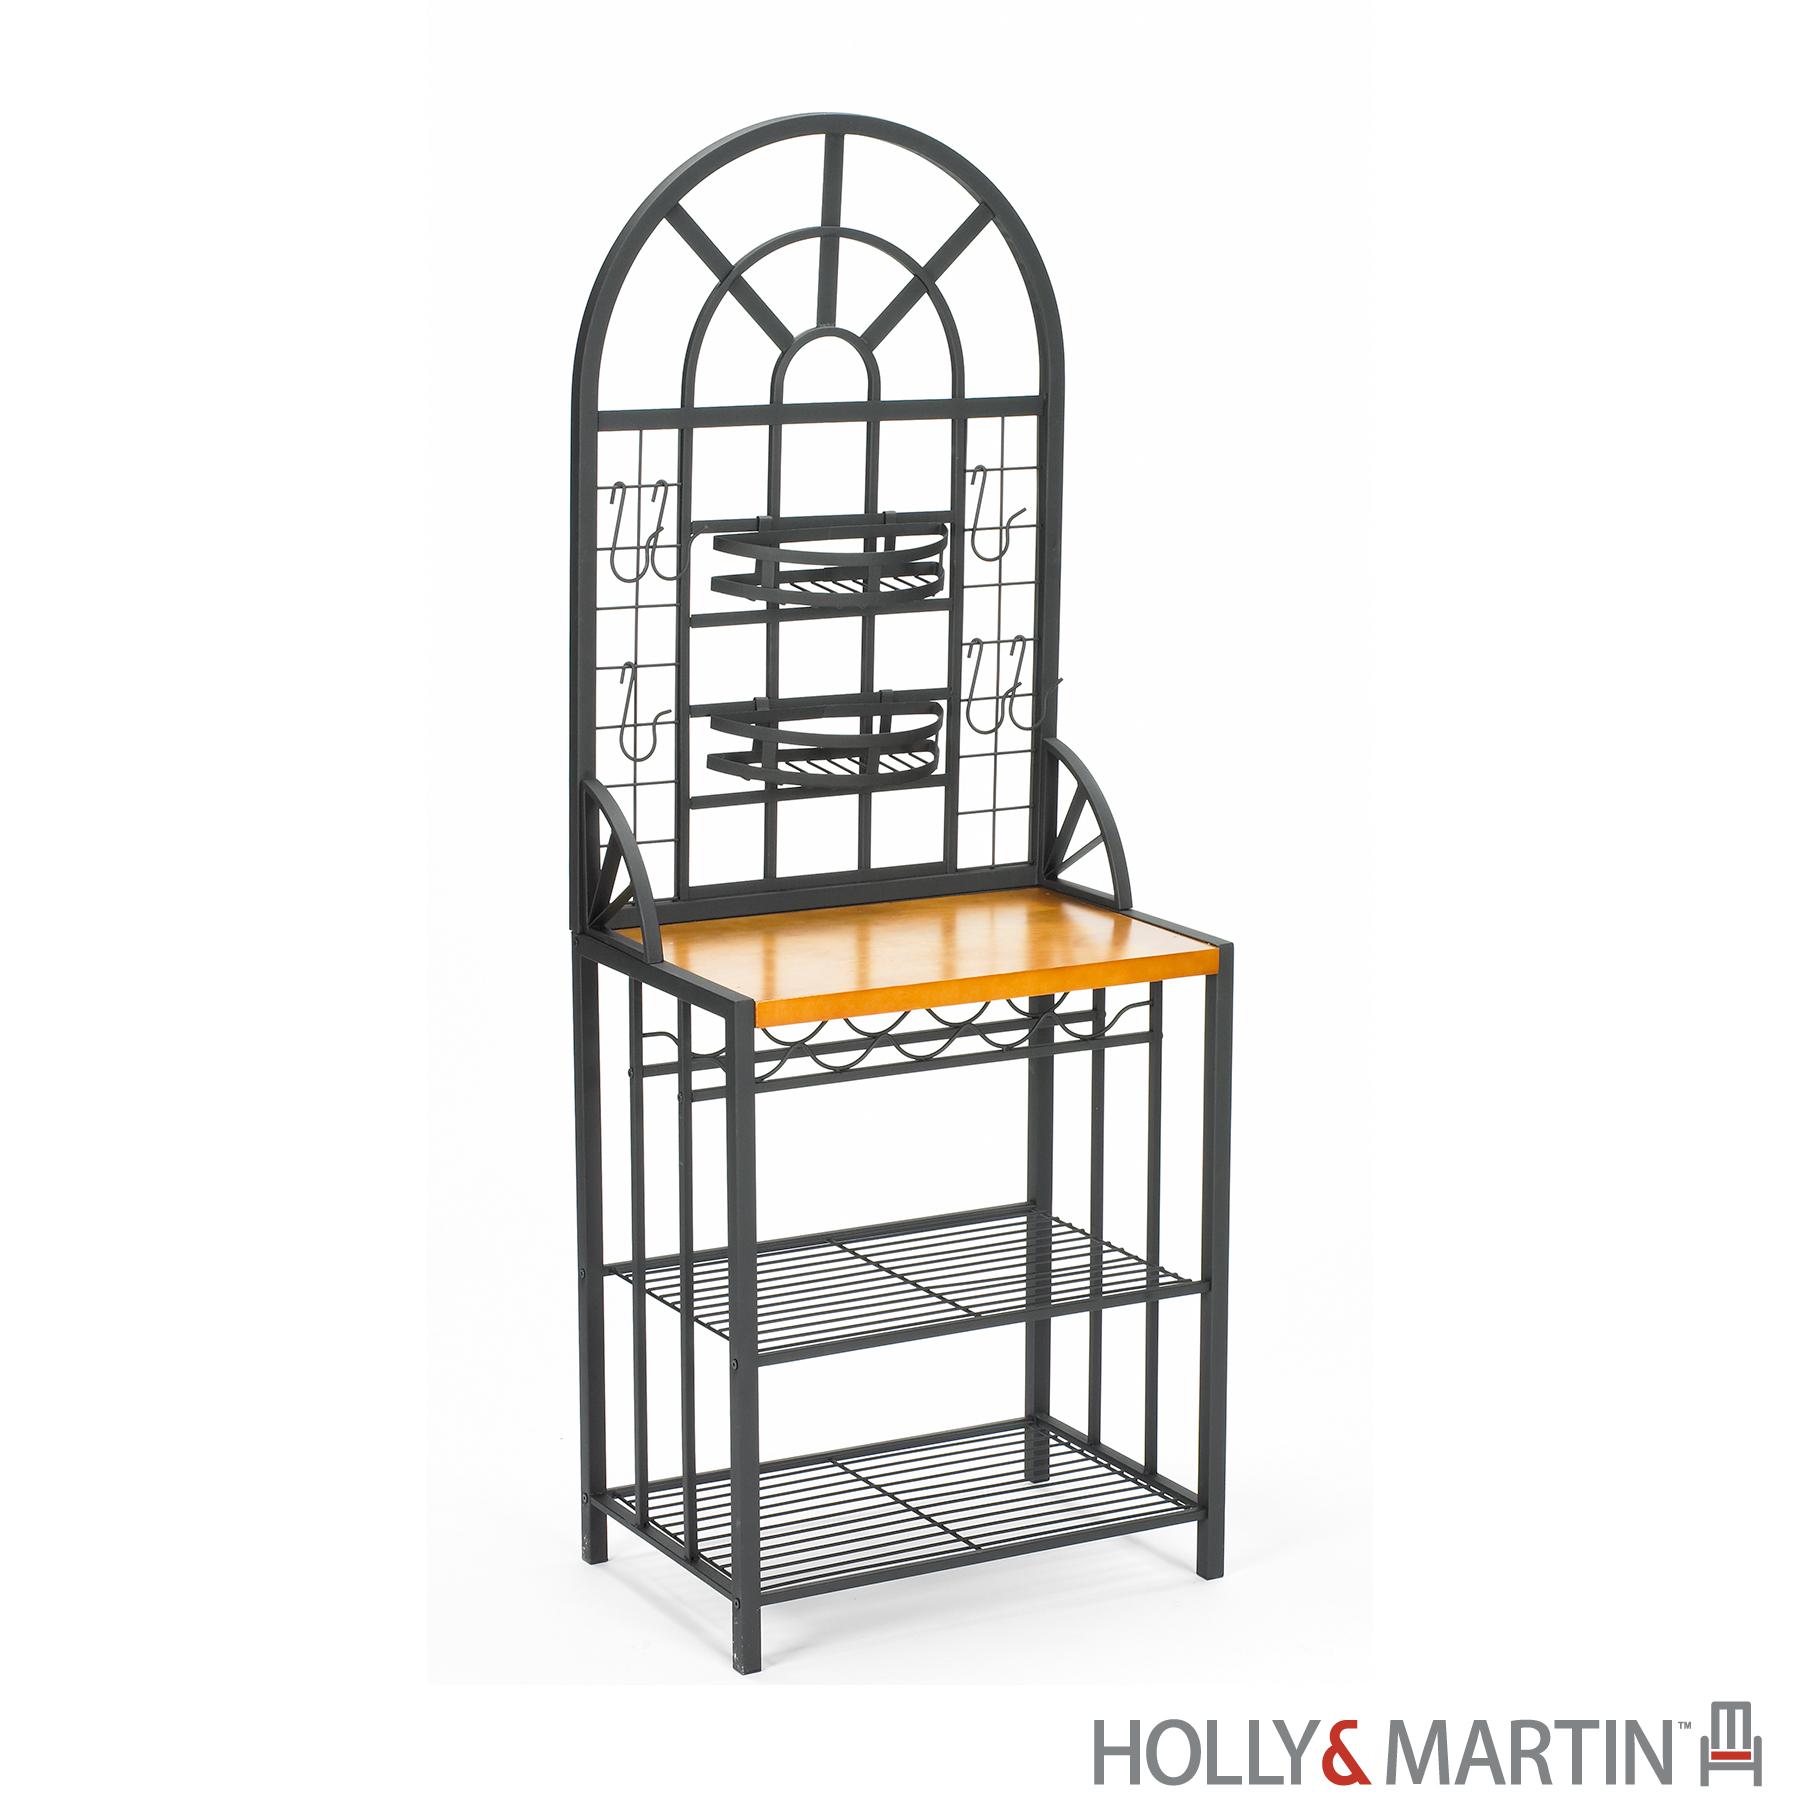 Holly & Martin's Summit Baker's Rack & Wine Rack Combo w/ Oak Counter